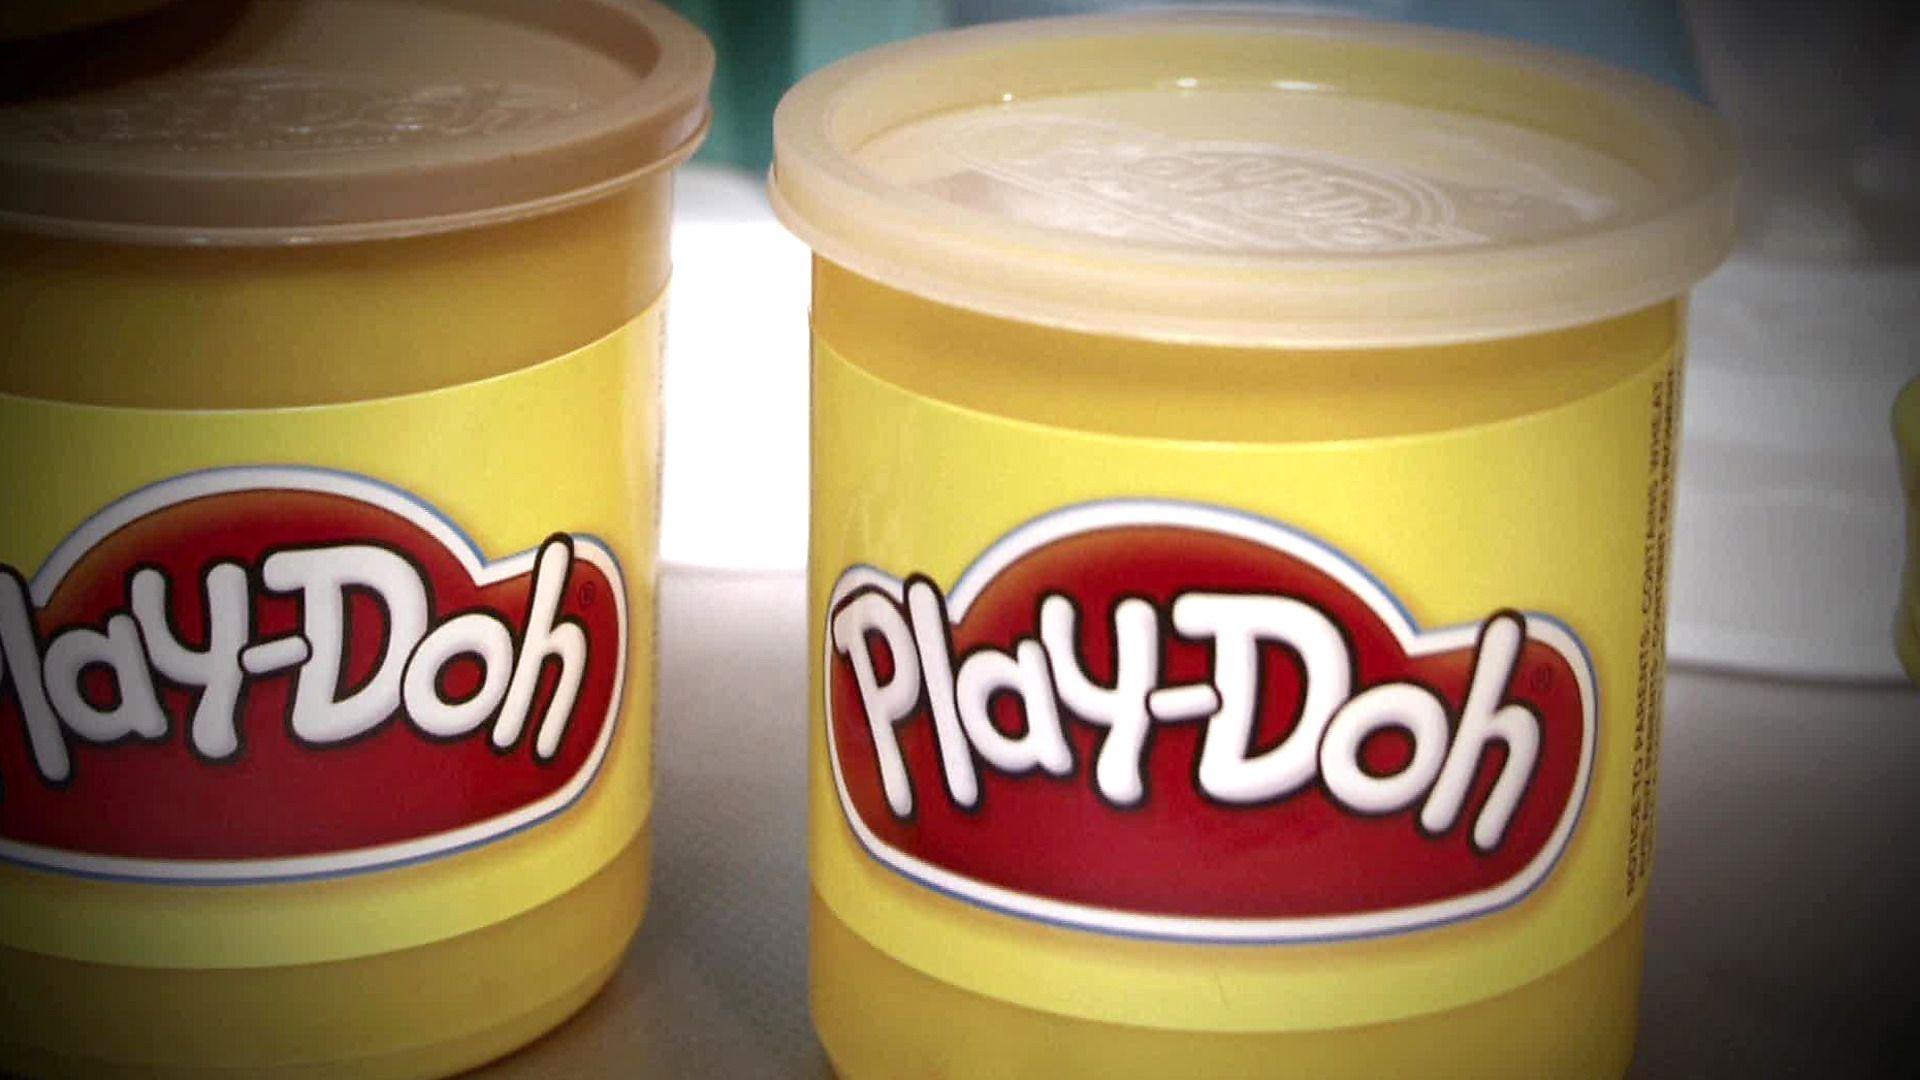 Play Doh Invented By Joe Mcvicker Of Cincinnati Ohio A Wallpaper